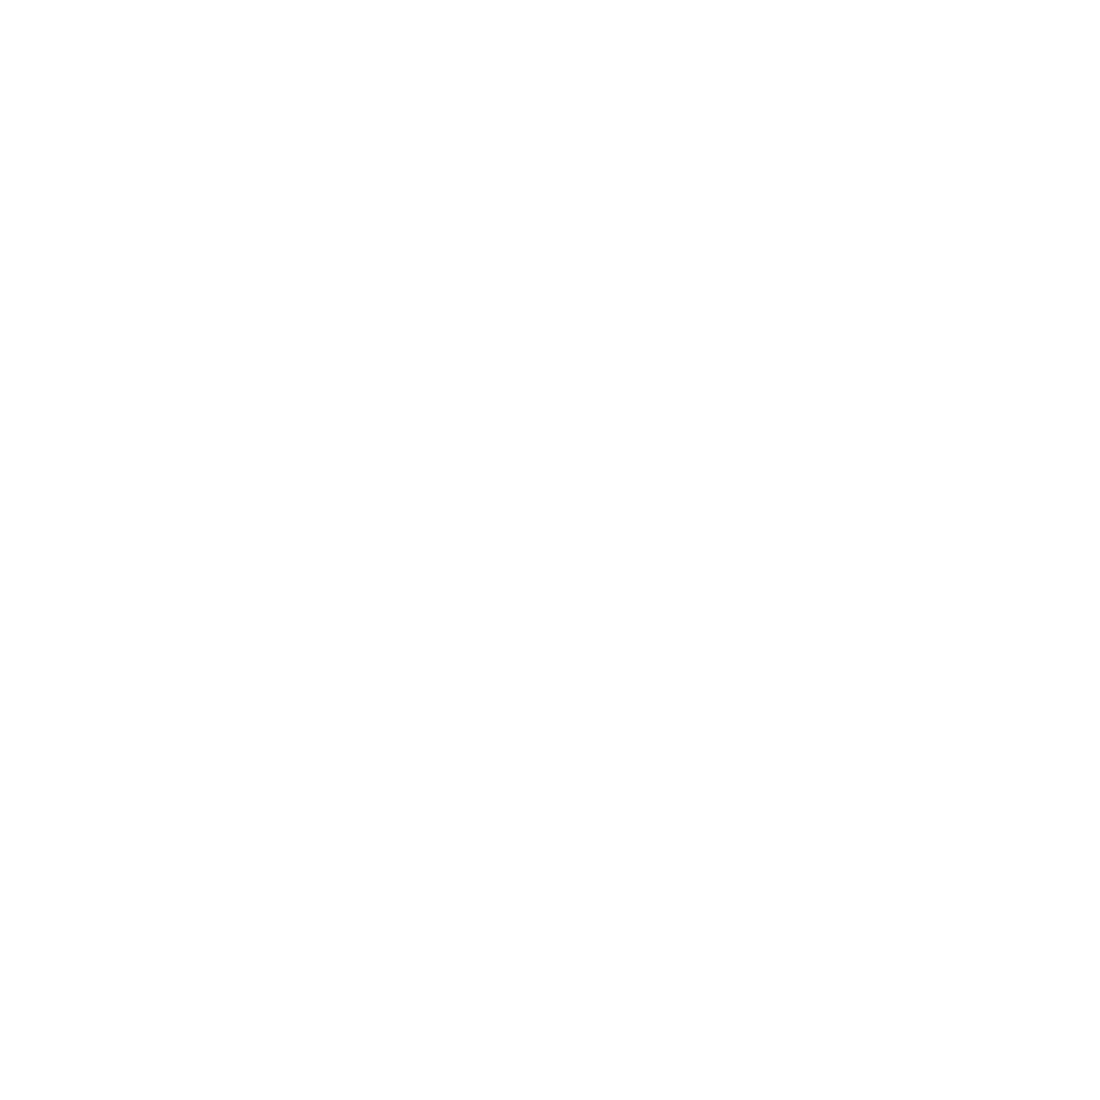 M47neFD Little Tartan Scottie Dog Taie d'oreiller 45, 7cm 45, 7cm meilidianpu B01LCLKAQY A square